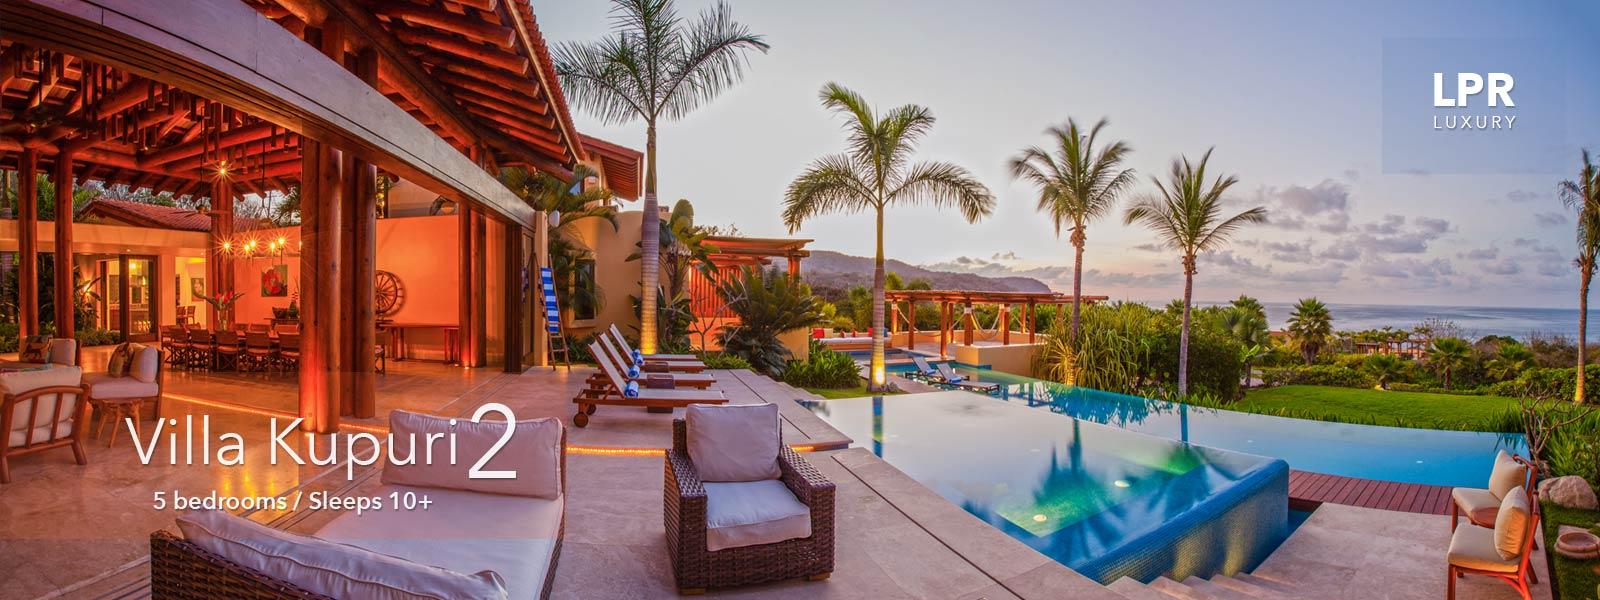 Villa La Kupuri 2 - Punta Mita Resort - Riviera Nayarit, Mexico